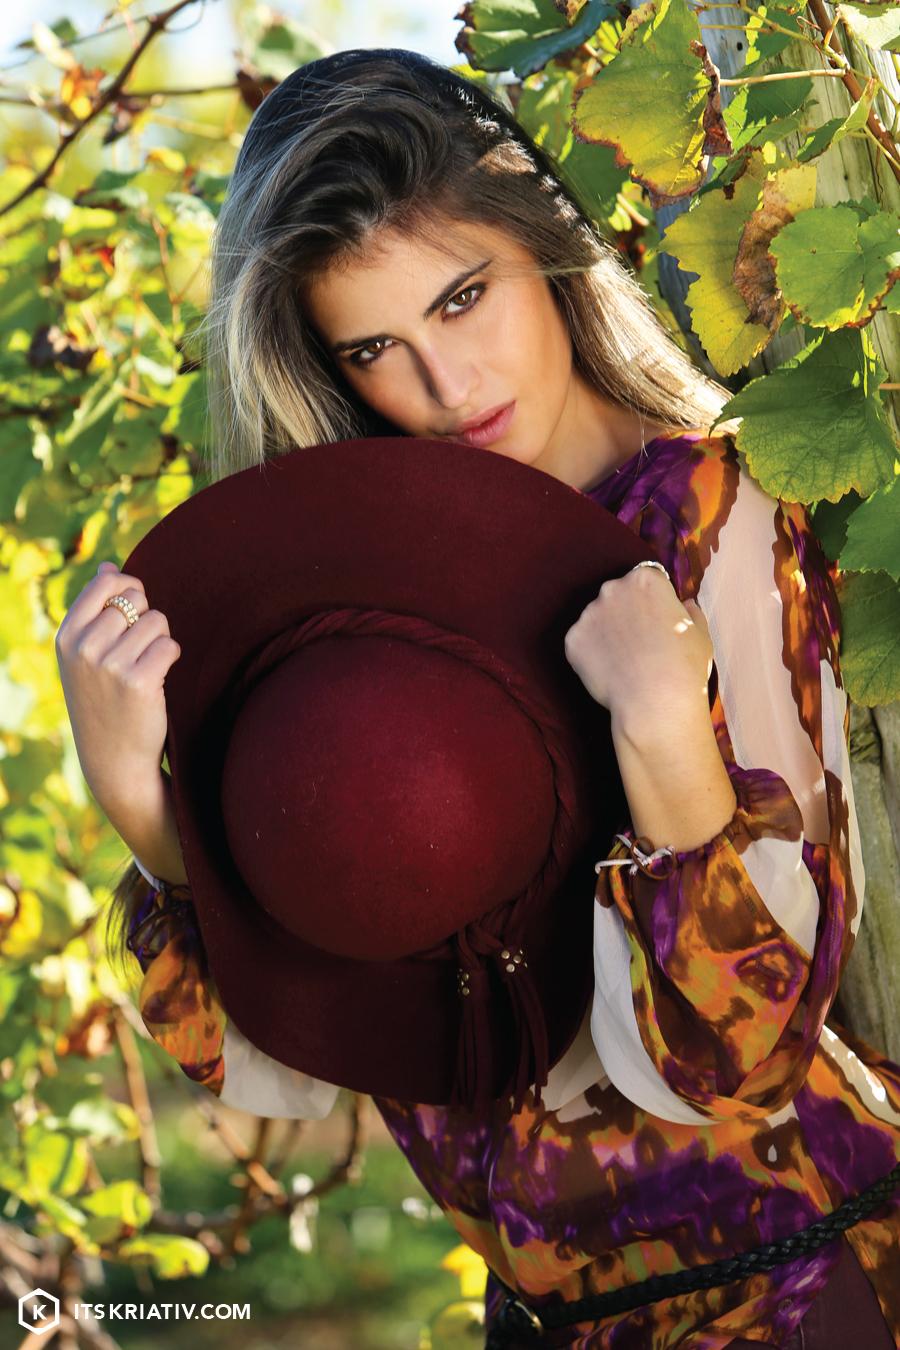 Nov_13_Fashion-Vinyard-01a-05.jpg